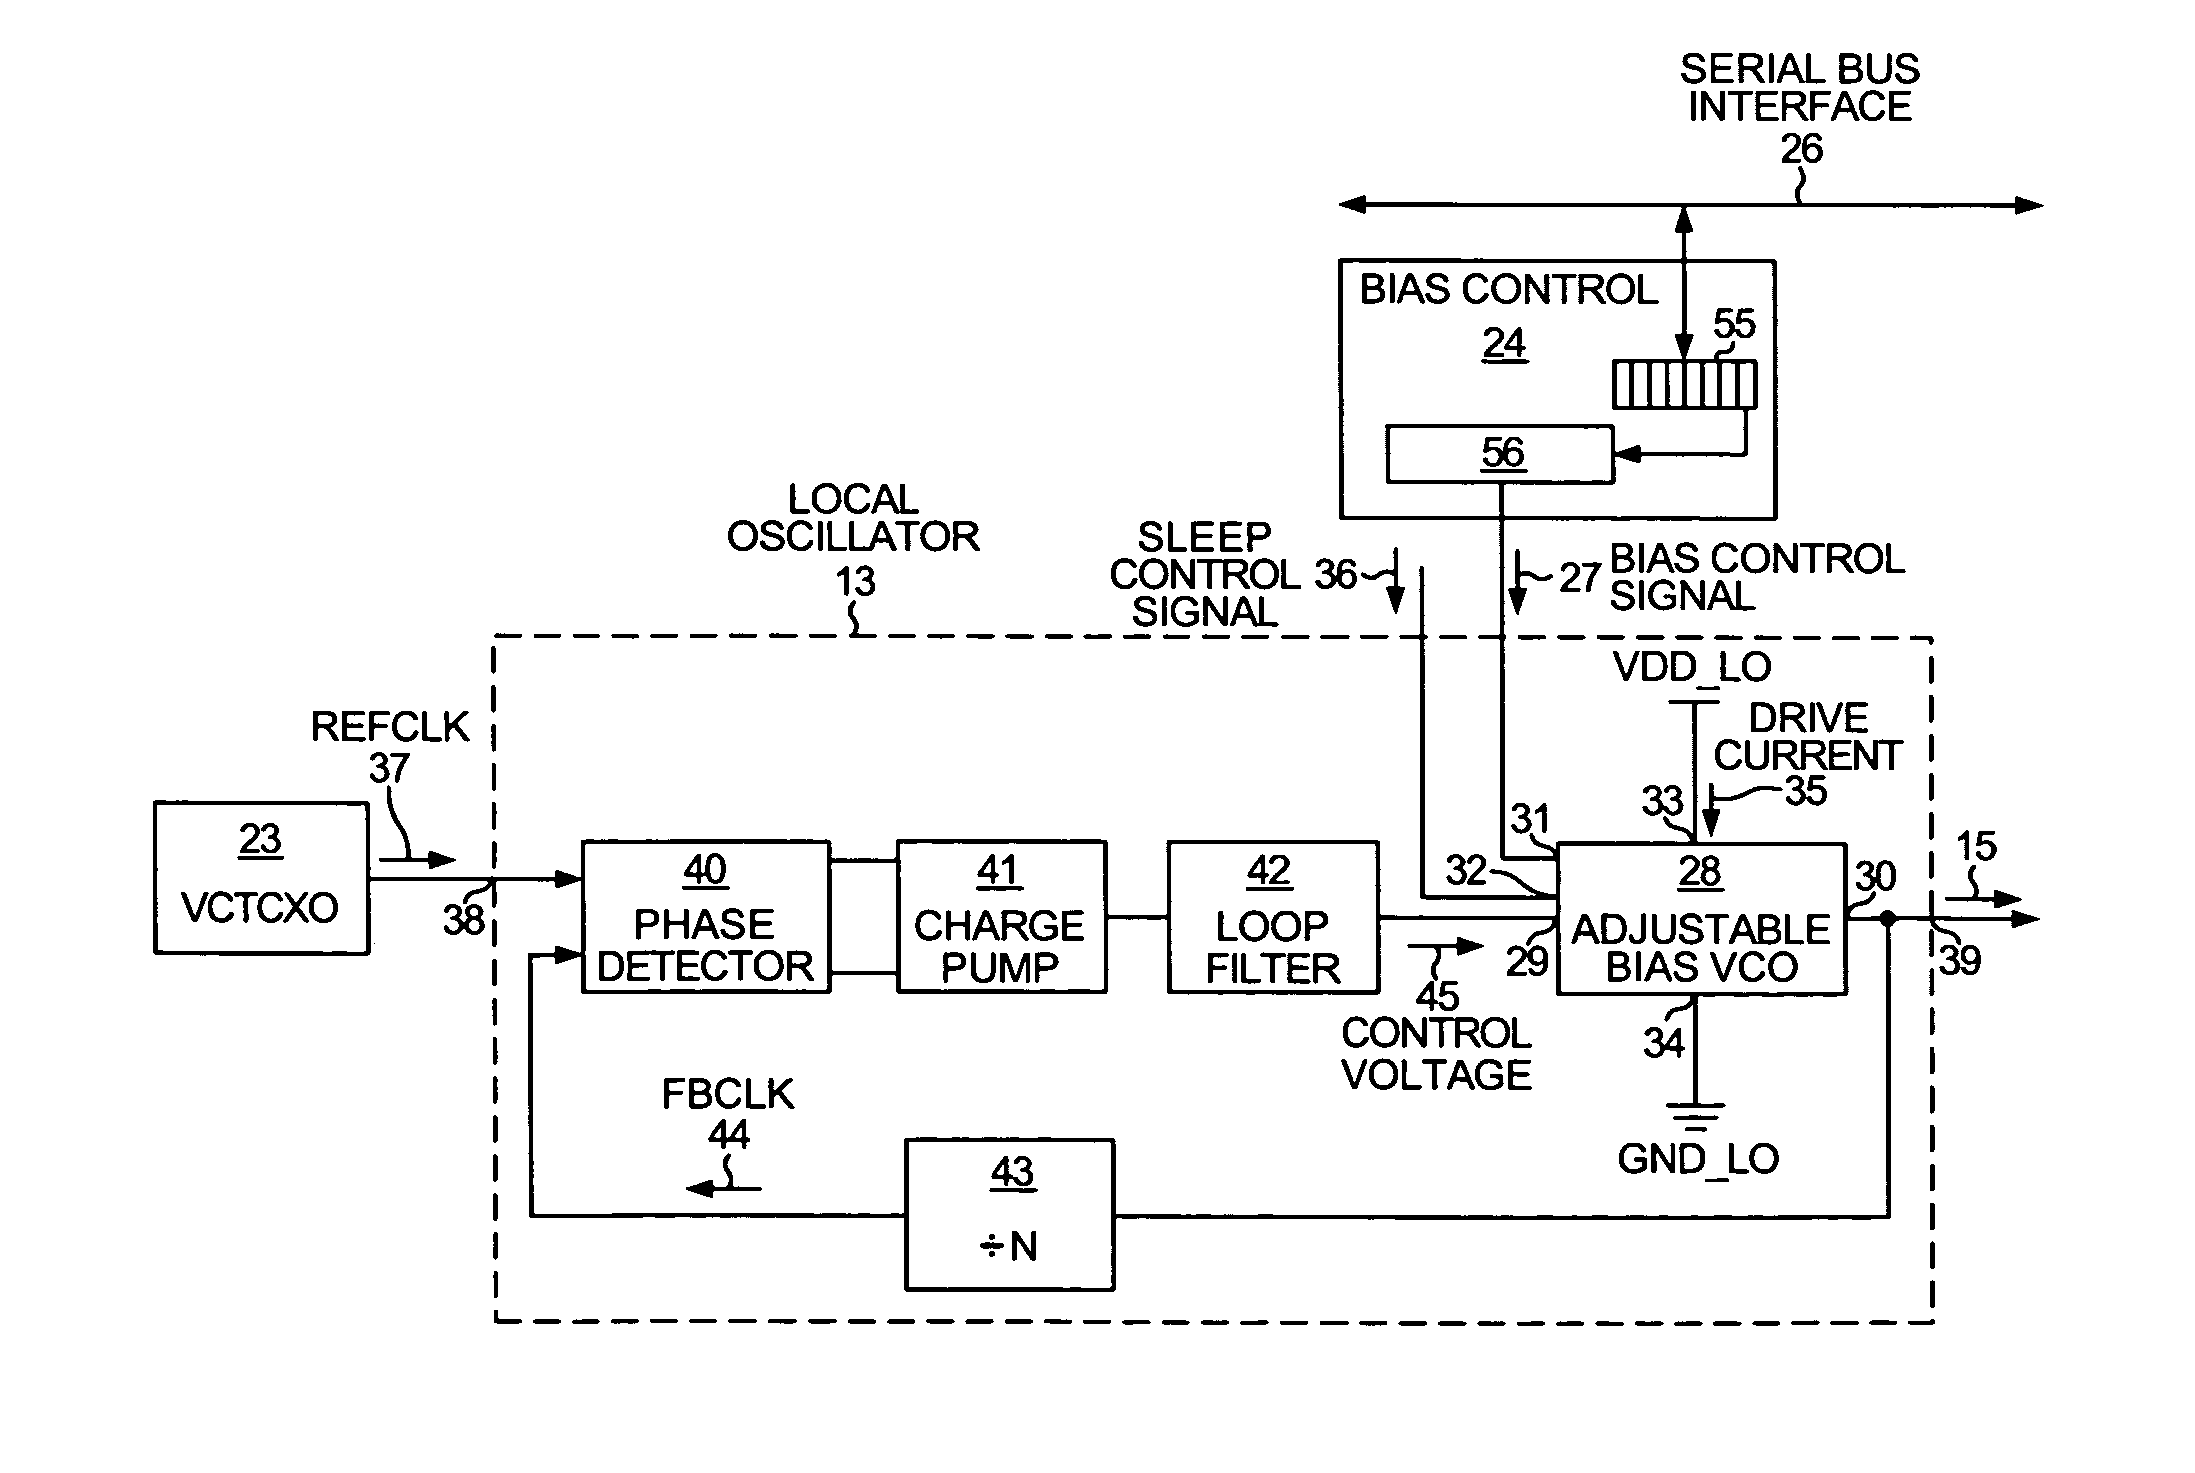 Patent Us20050134336 Adjustable Bias Vco Google Patents Circuit Diagram Drawing